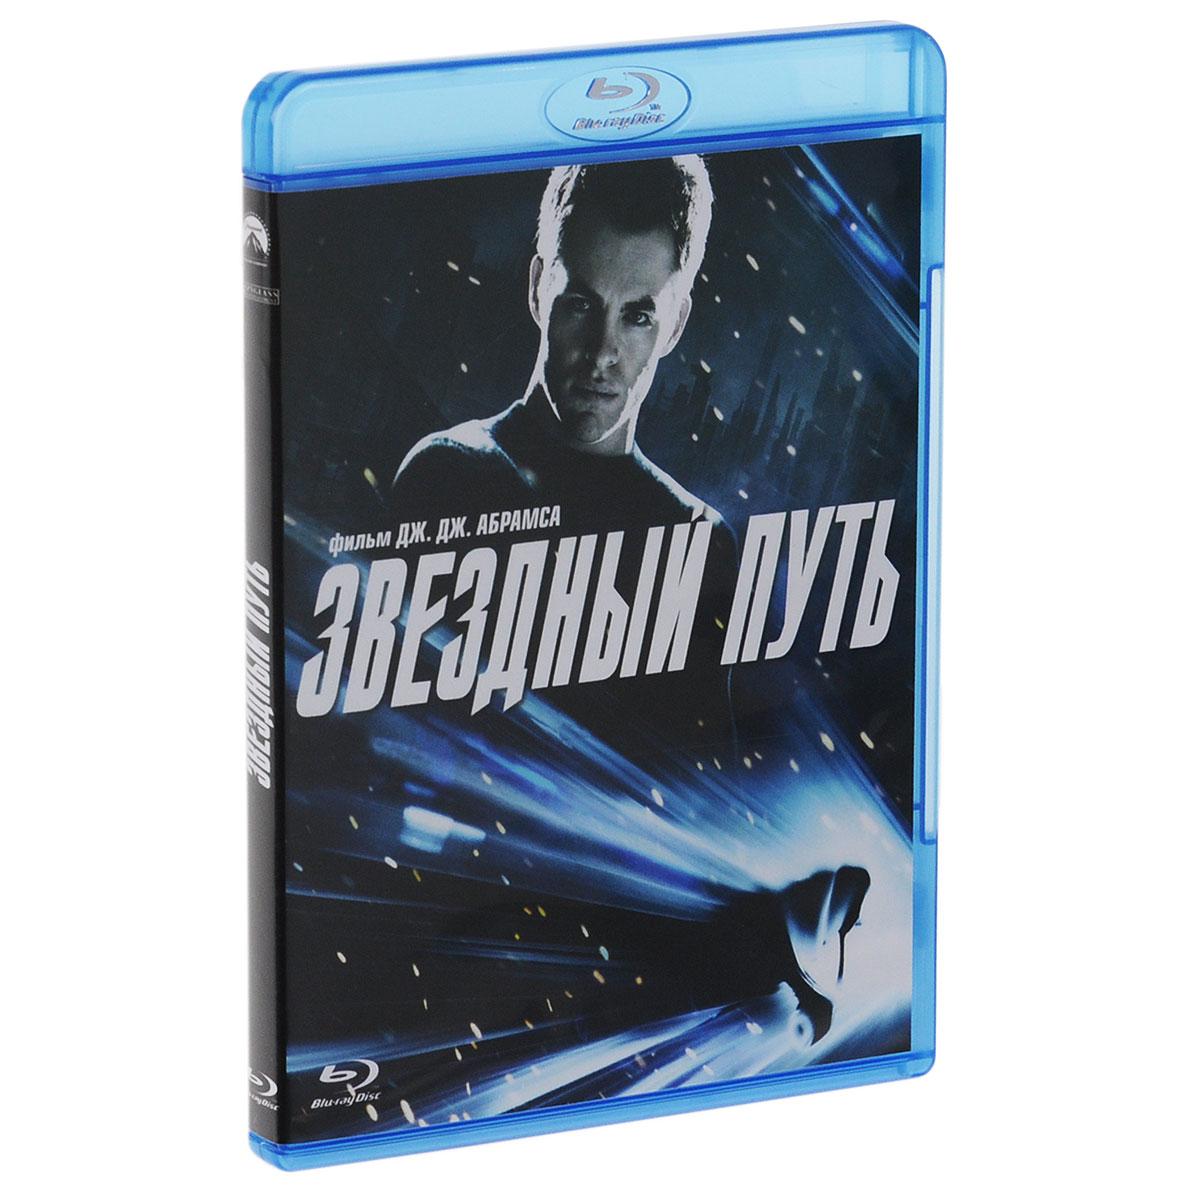 Звездный путь (Blu-ray) путь желания